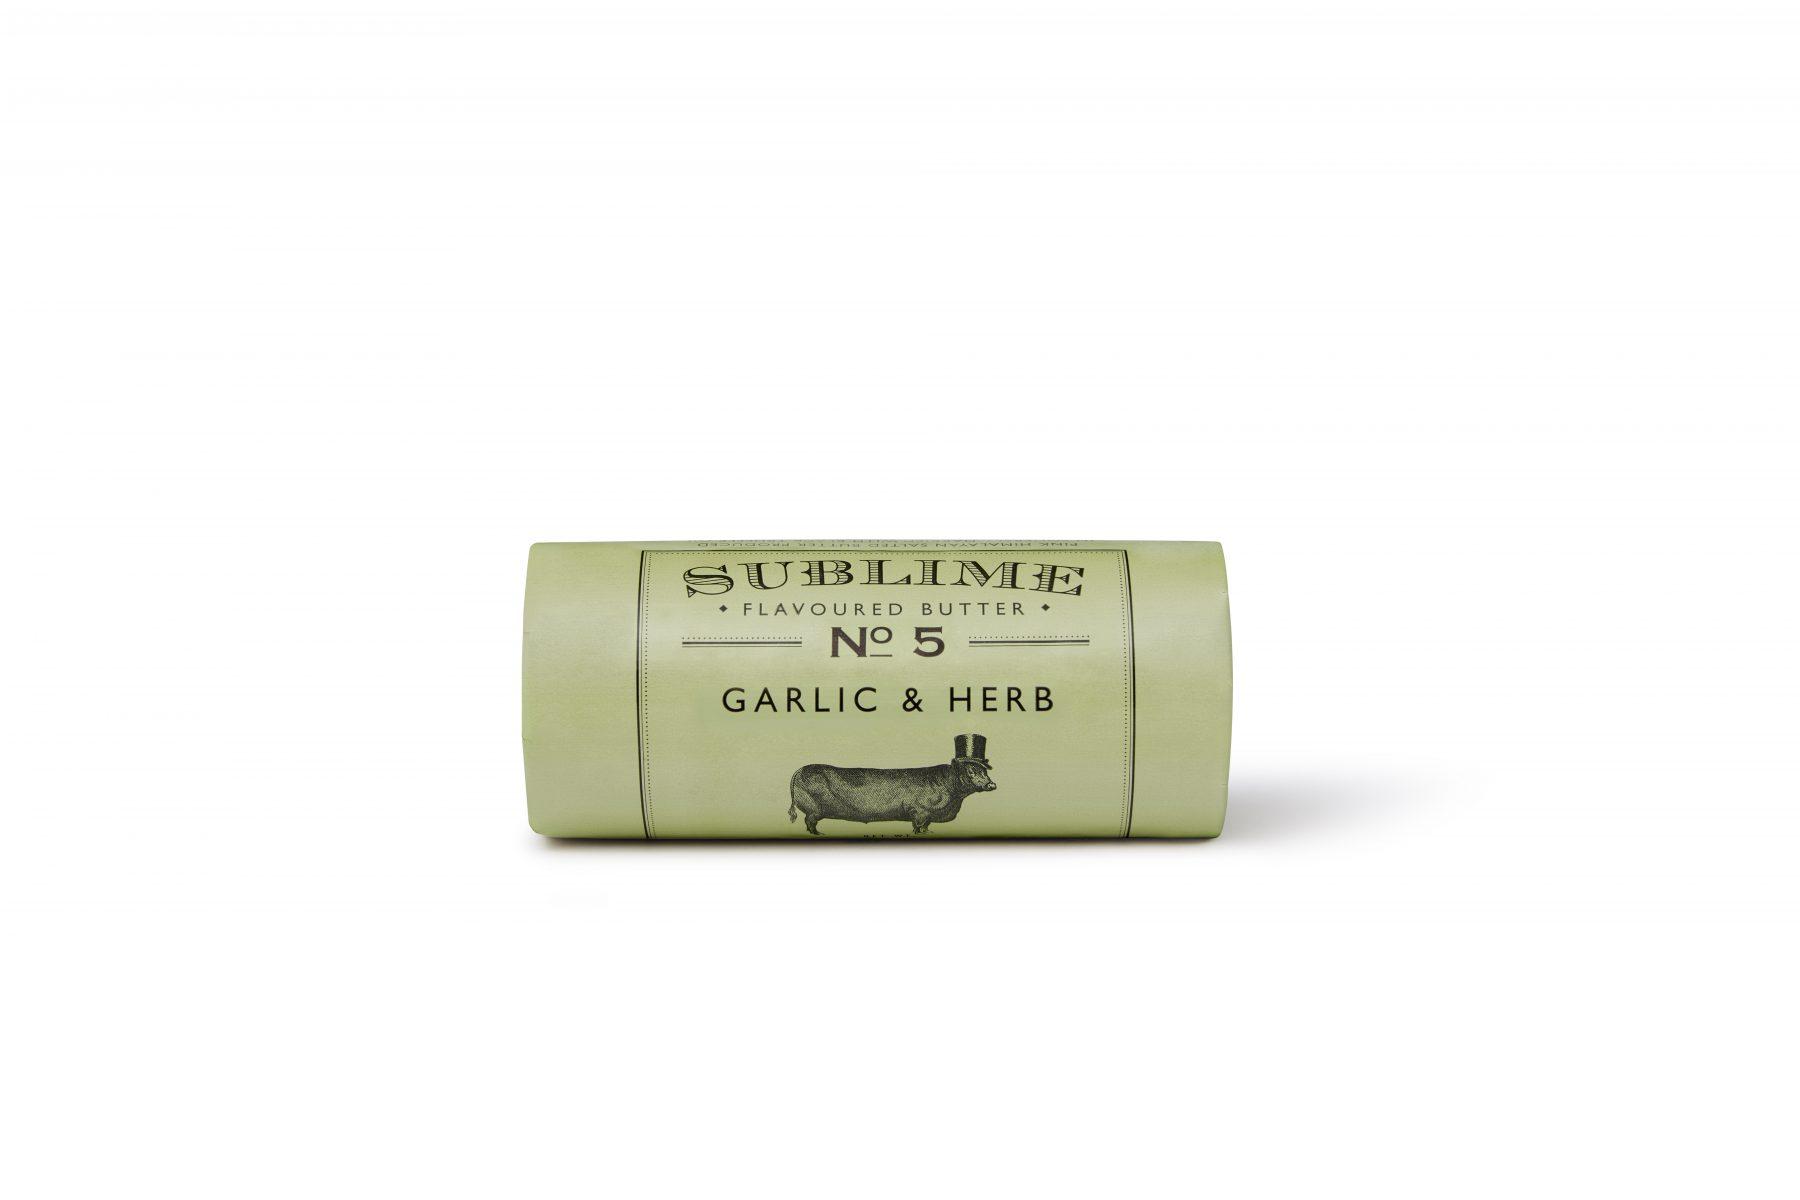 Garlic & Herb